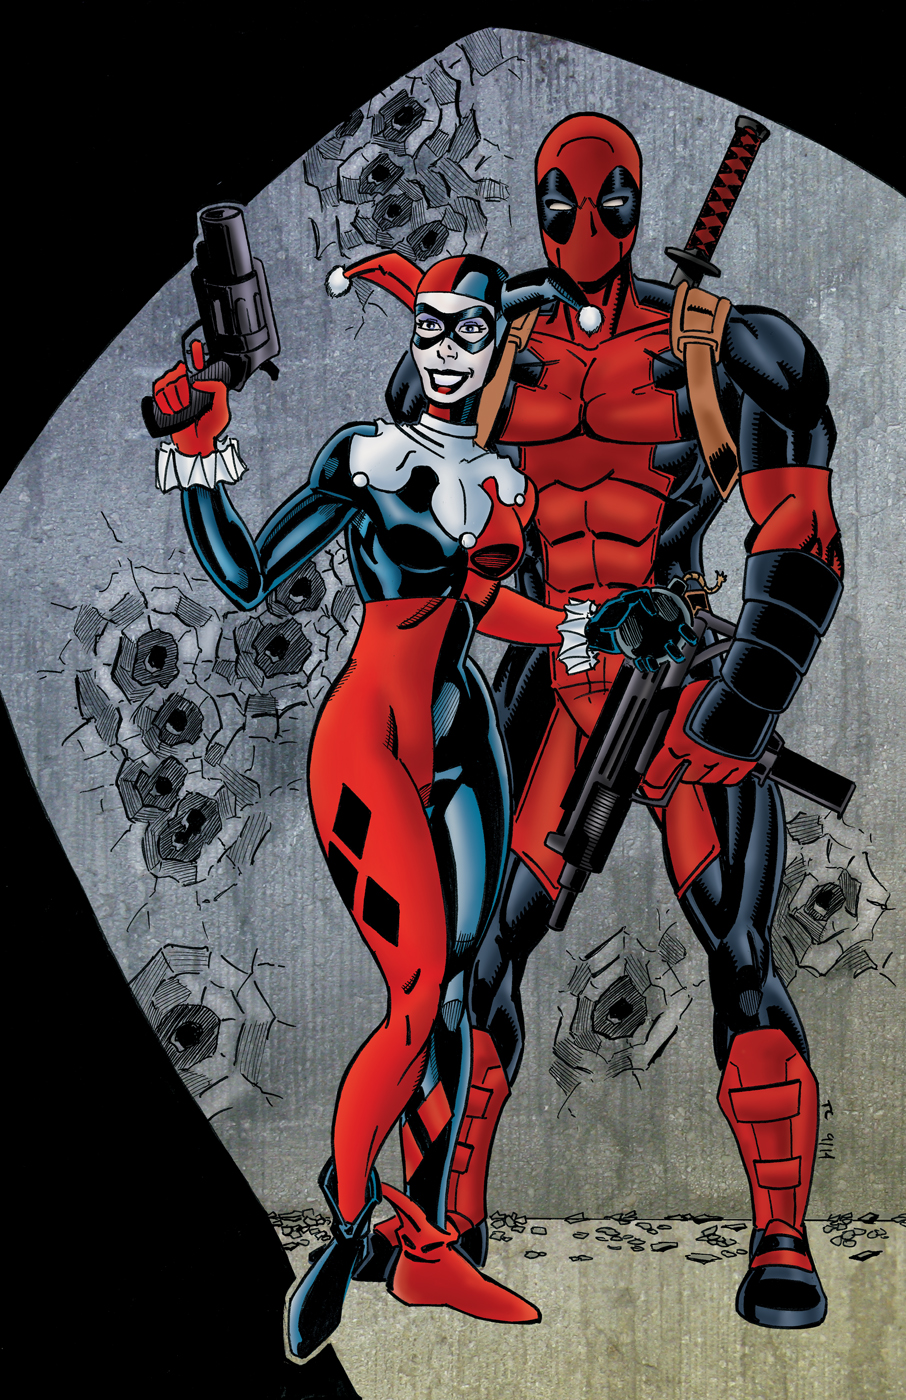 Harley quinn and deadpool colored by ninjaspidey on deviantart - Deadpool harley quinn ...